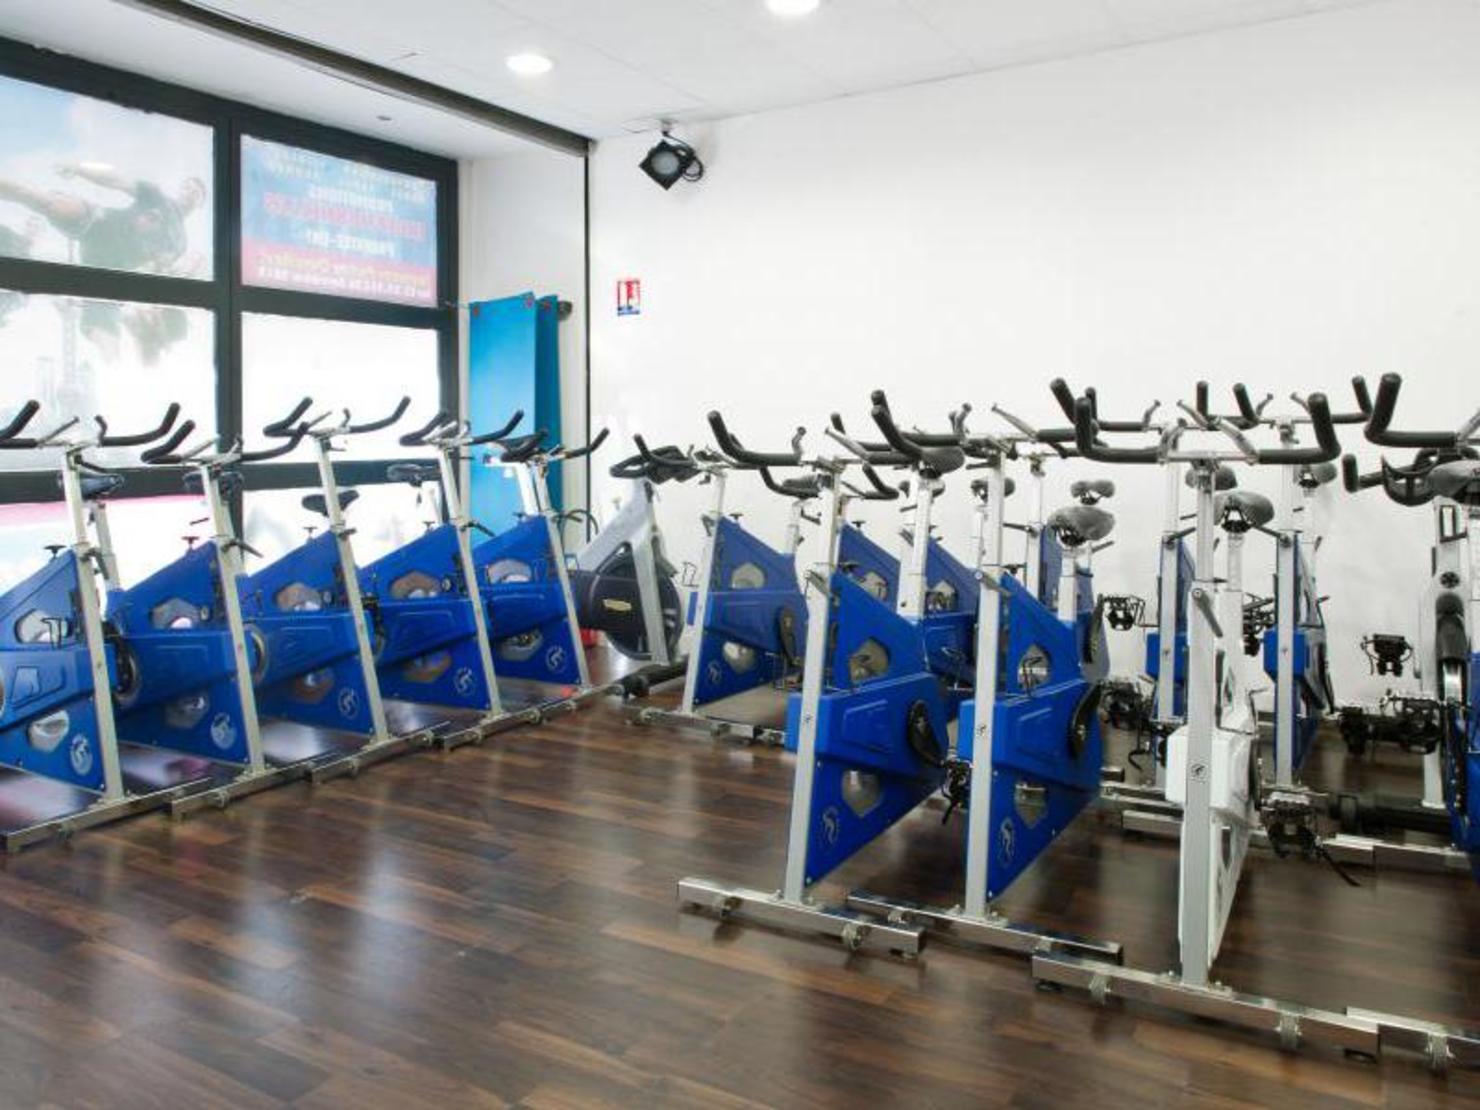 fitness story 17 tarifs avis horaires essai gratuit